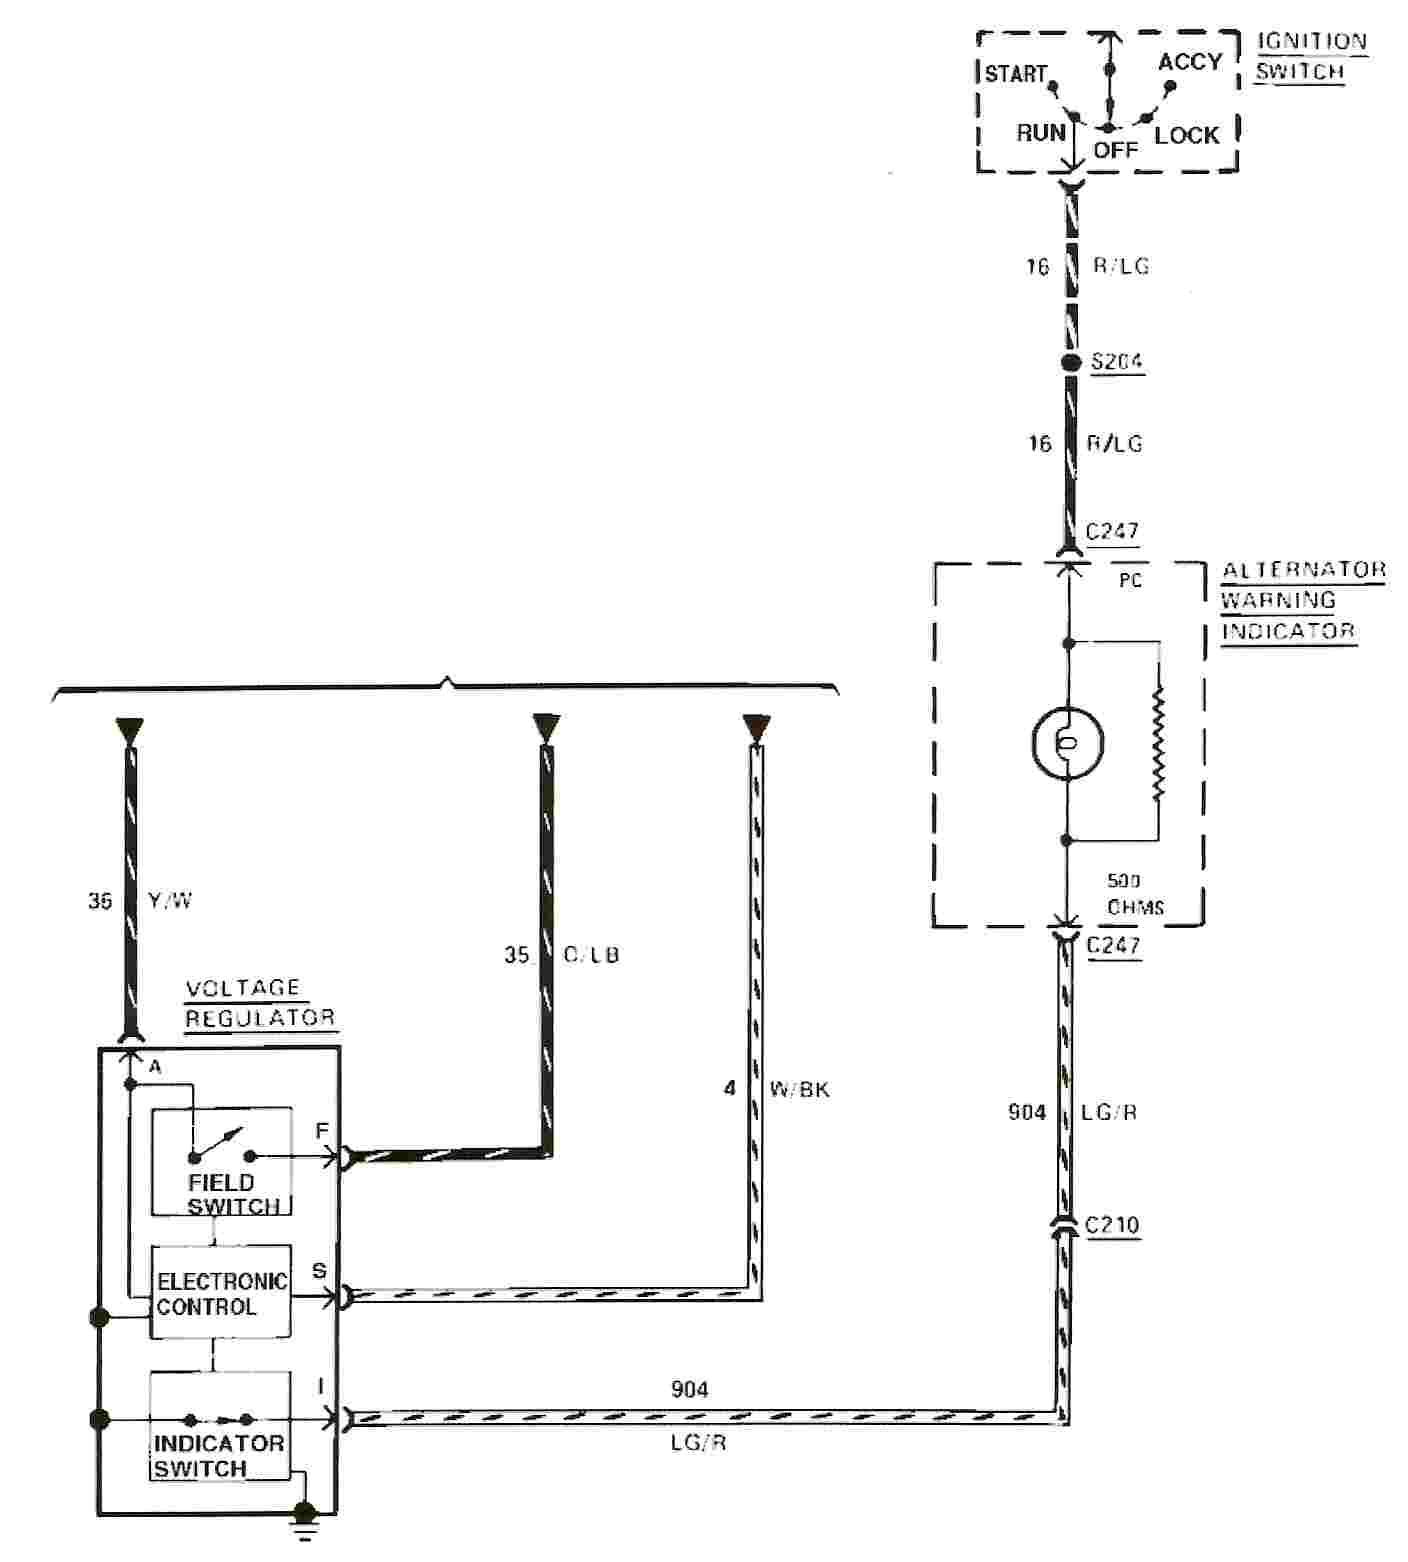 Wiring Diagram Ibanez 540s Schematic